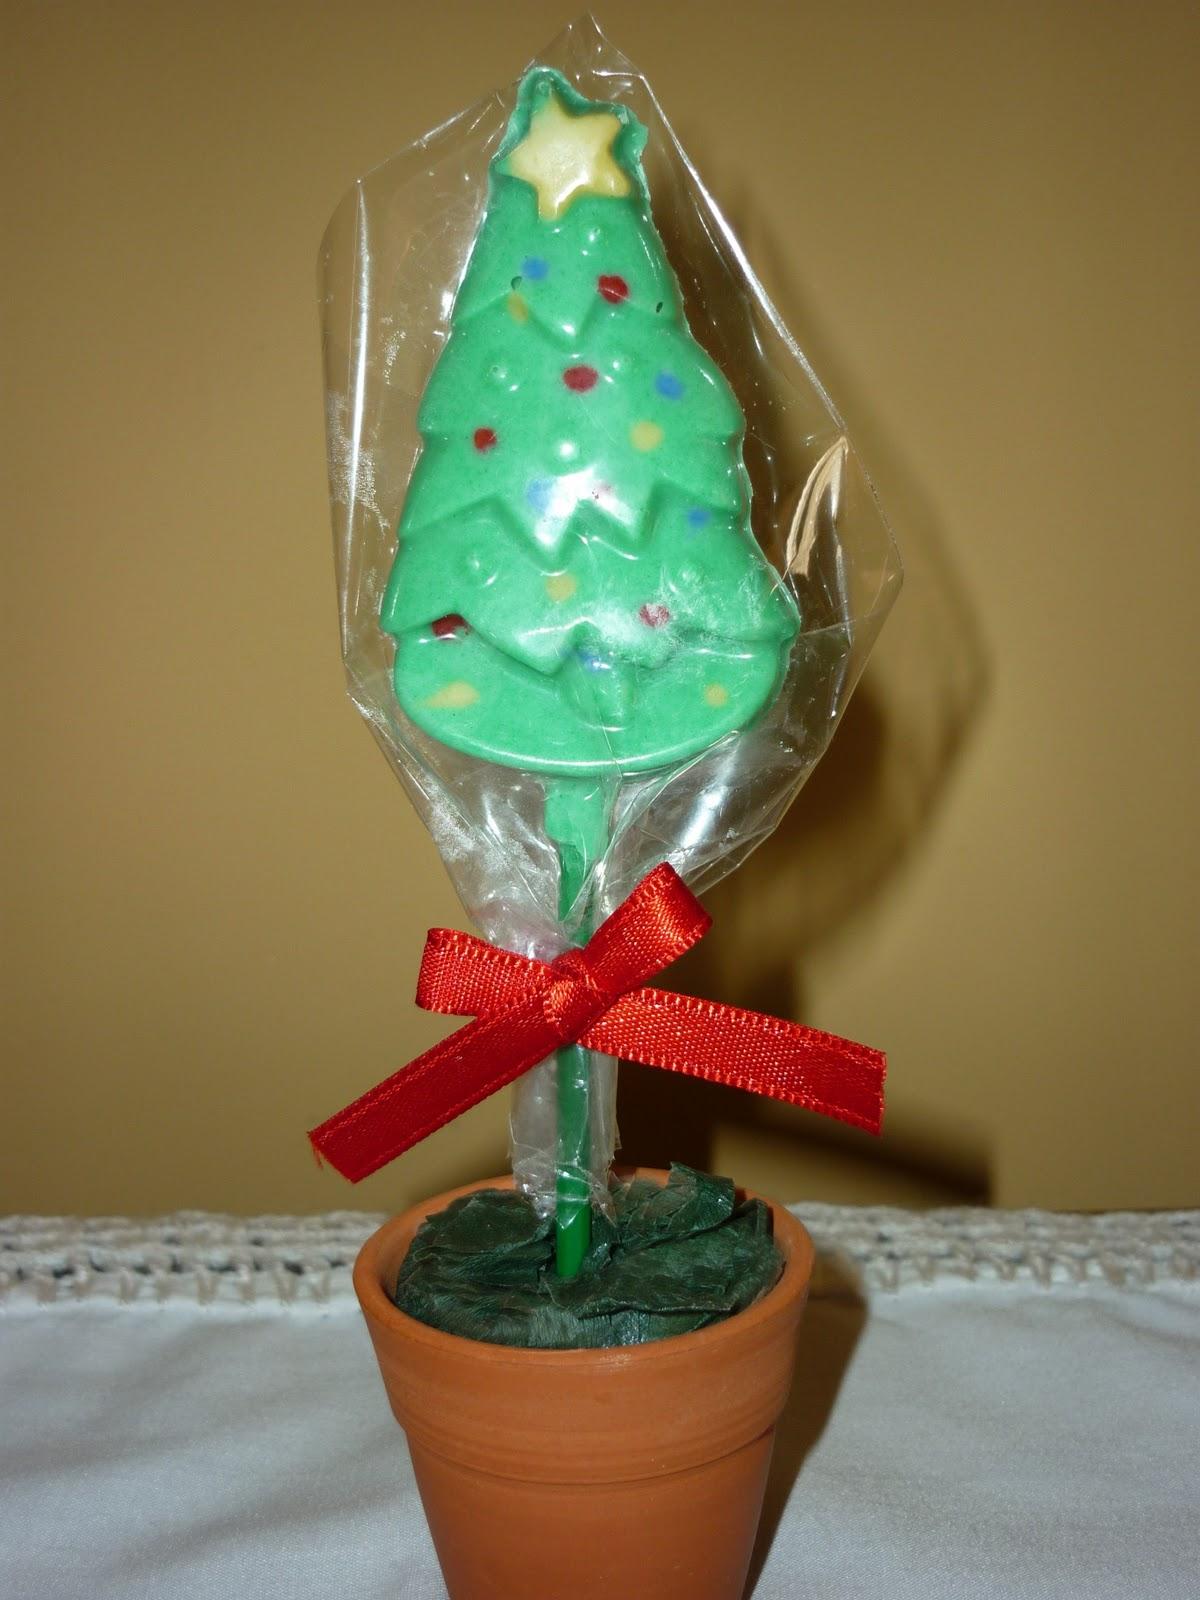 Dulce detalle seguimos con detalles de navidad for Detalles de navidad